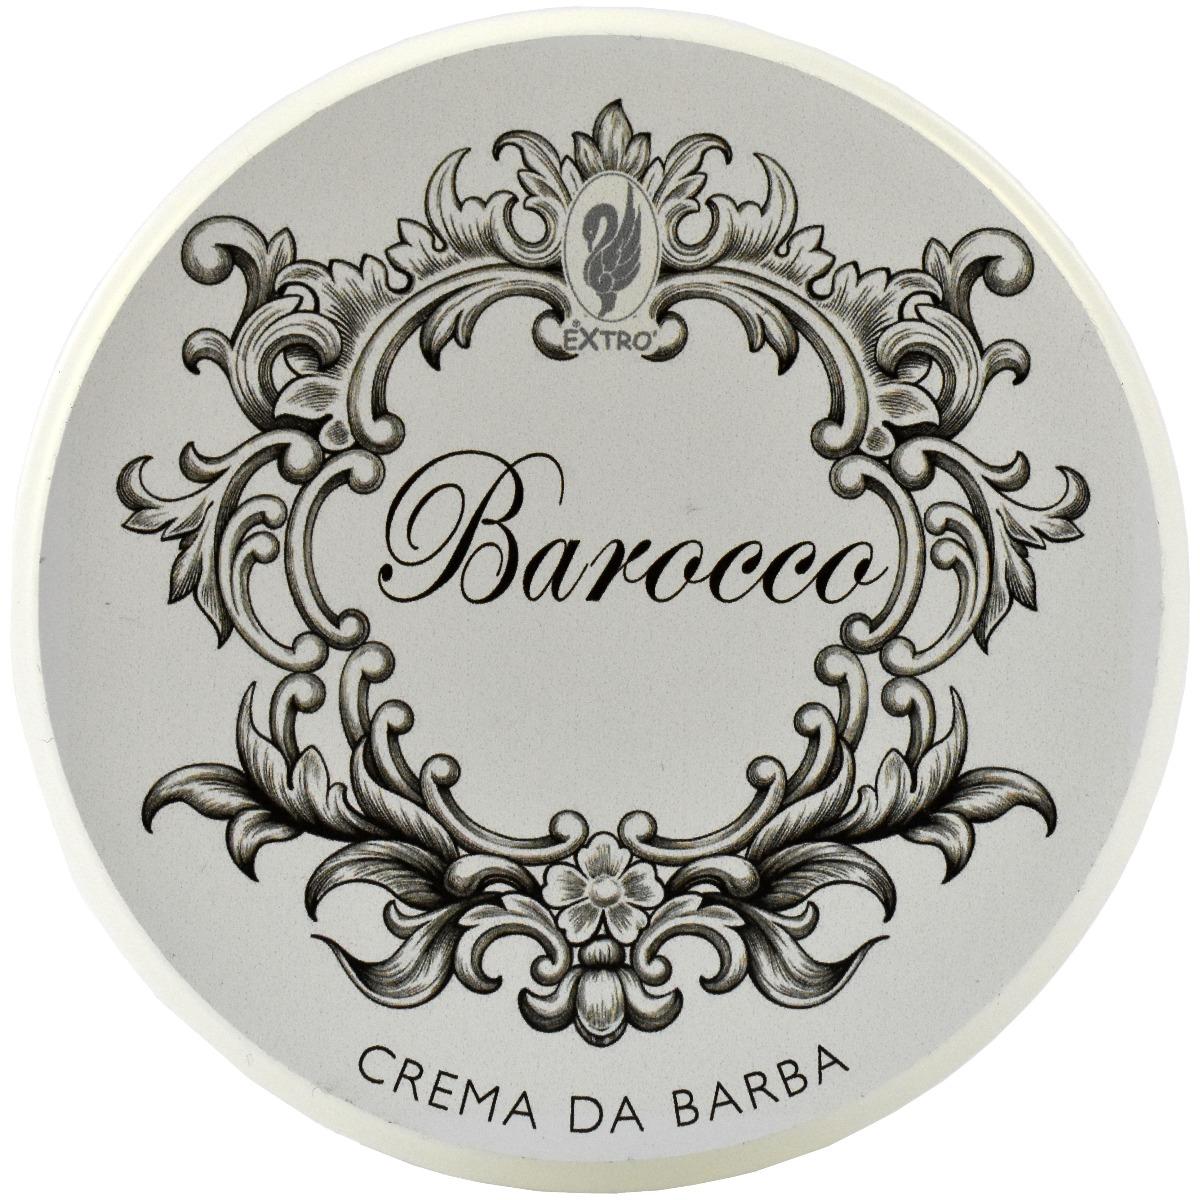 Extro Cosmesi Barocco Shaving Cream 150ml